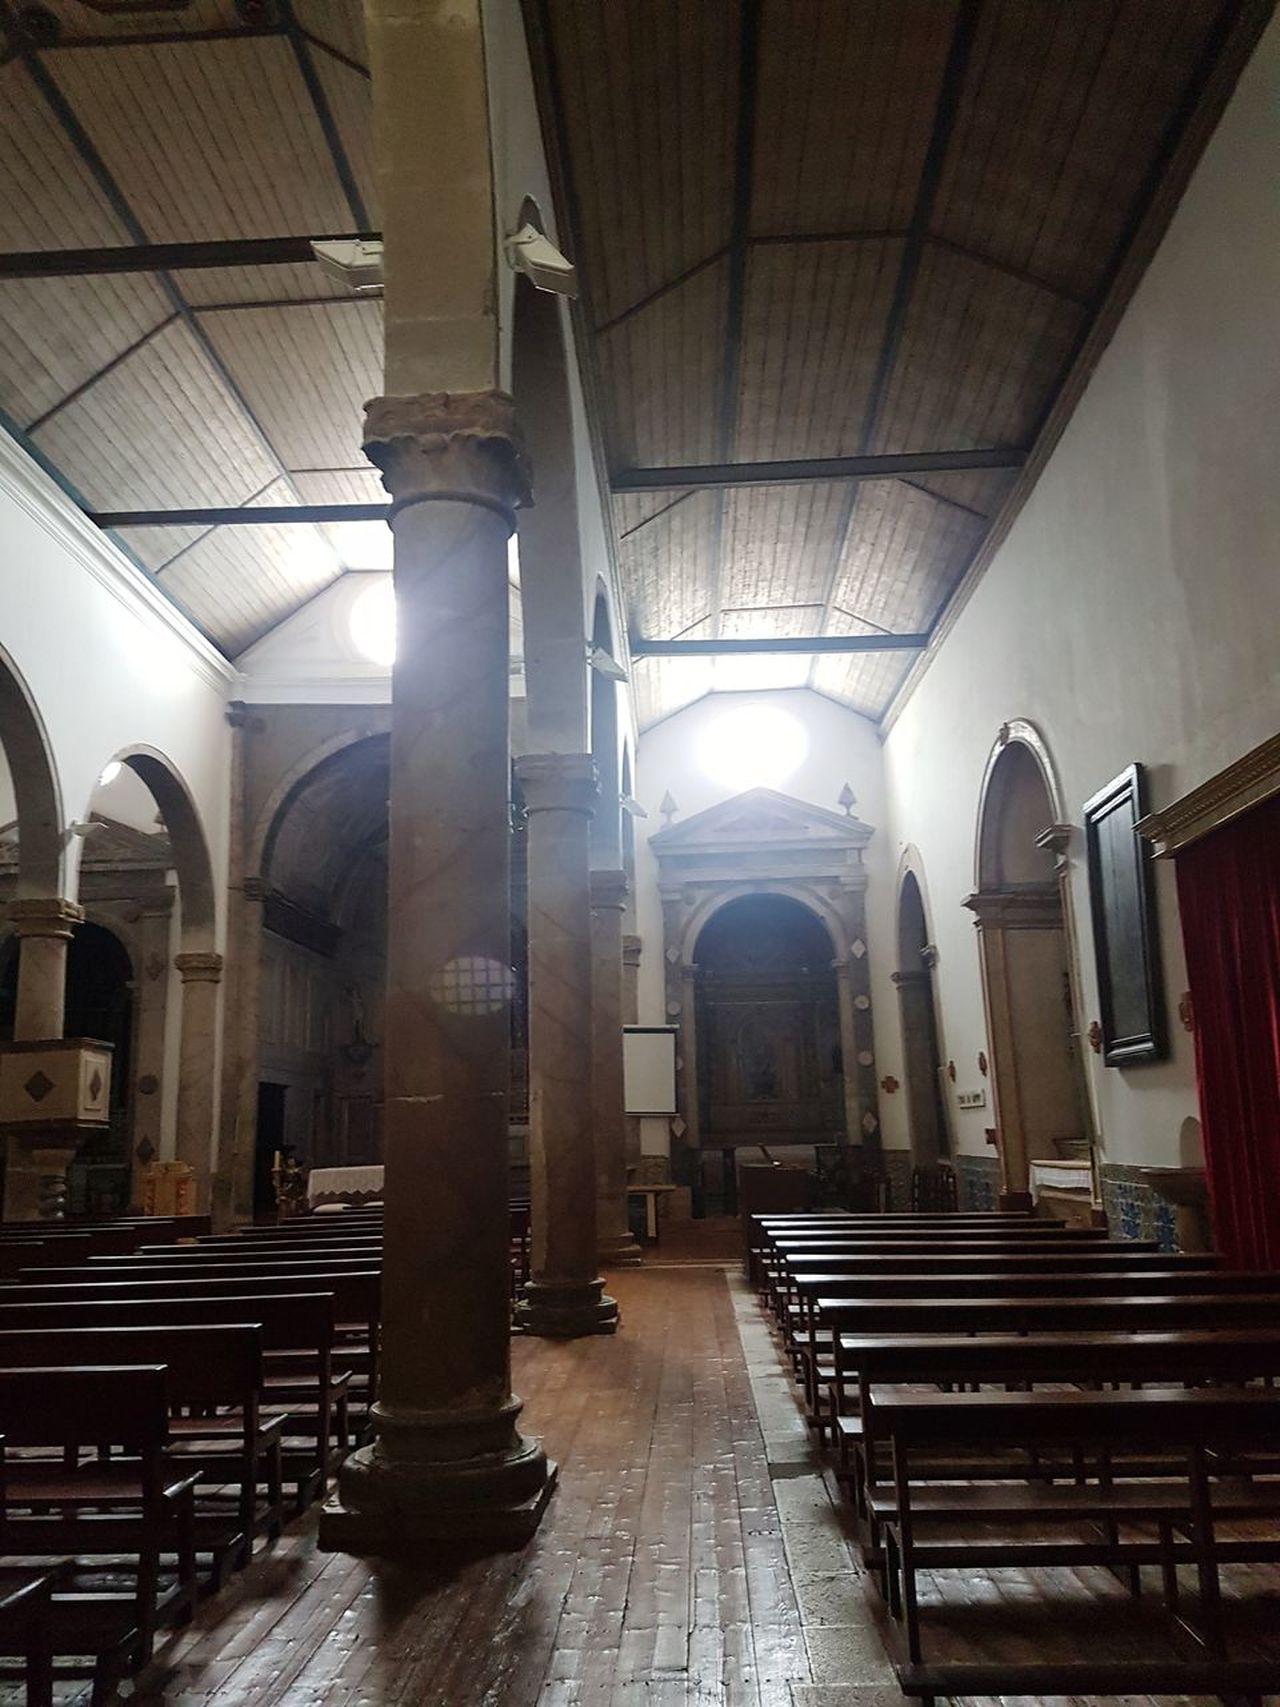 Architecture Illuminated Church Pray Catholic Spirituality Place Of Worship Religion Confession Remember Indoors